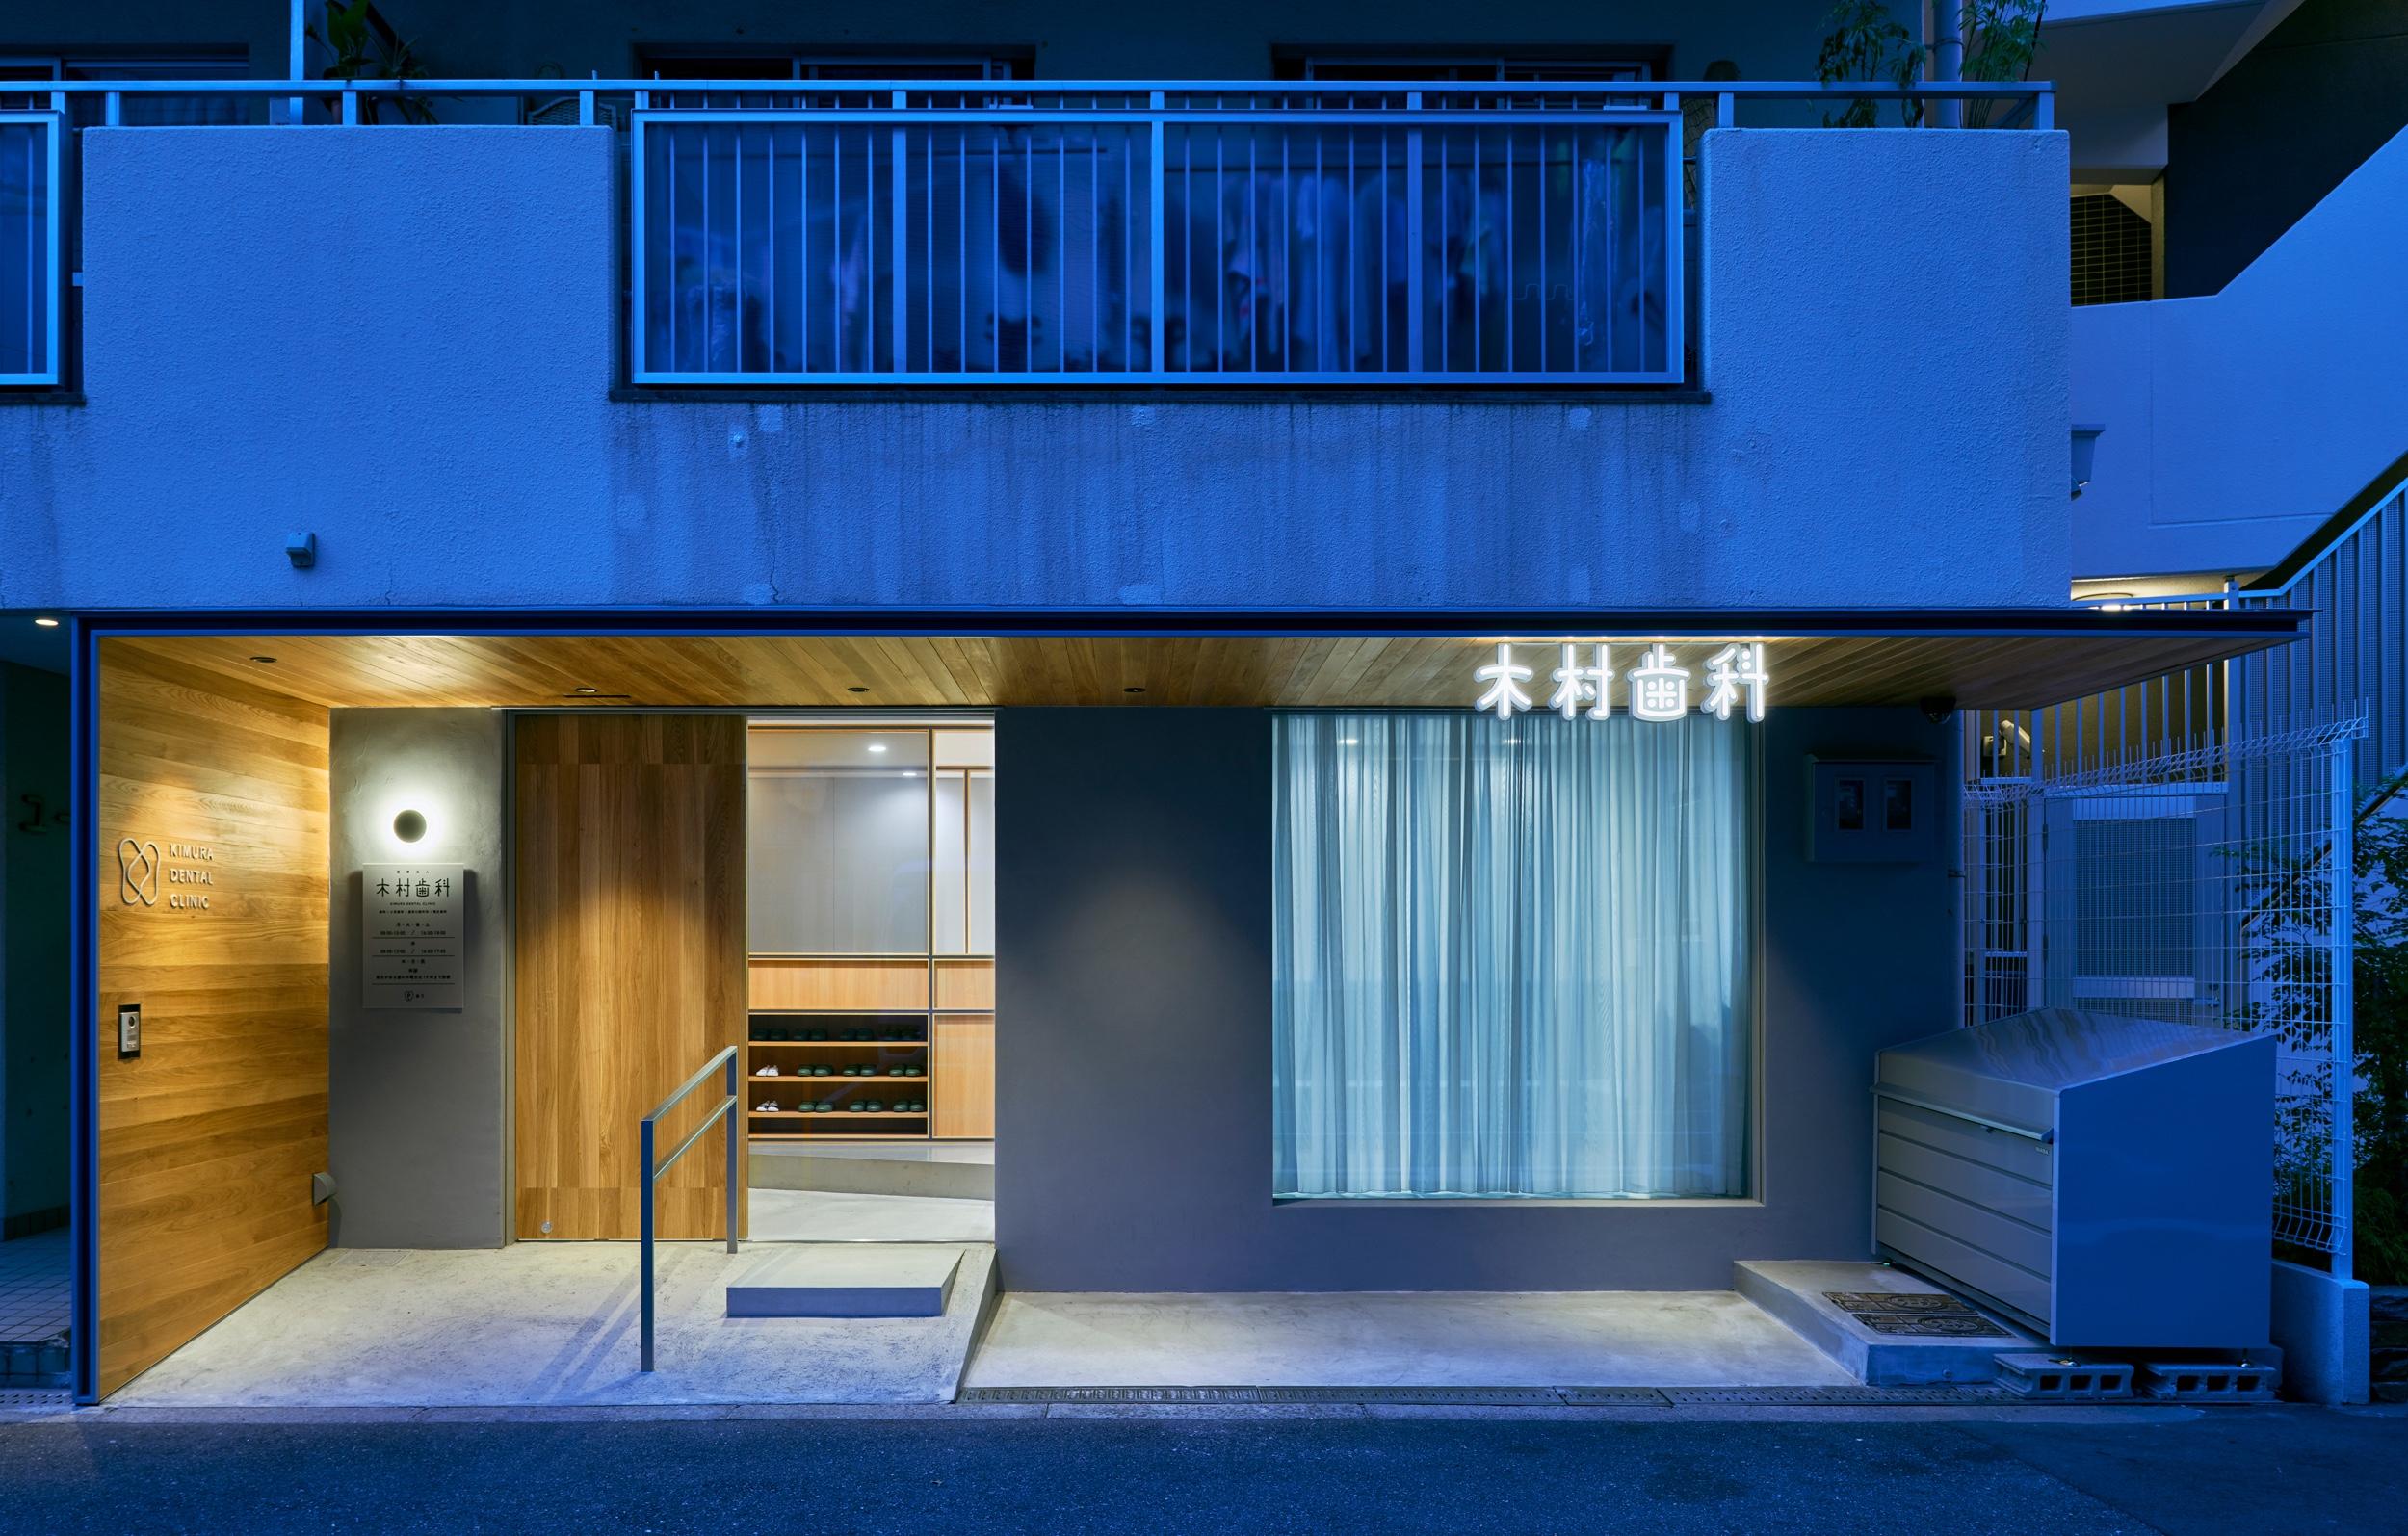 Kimura Dental Clinic 05s ©Takeshi Asano 2019